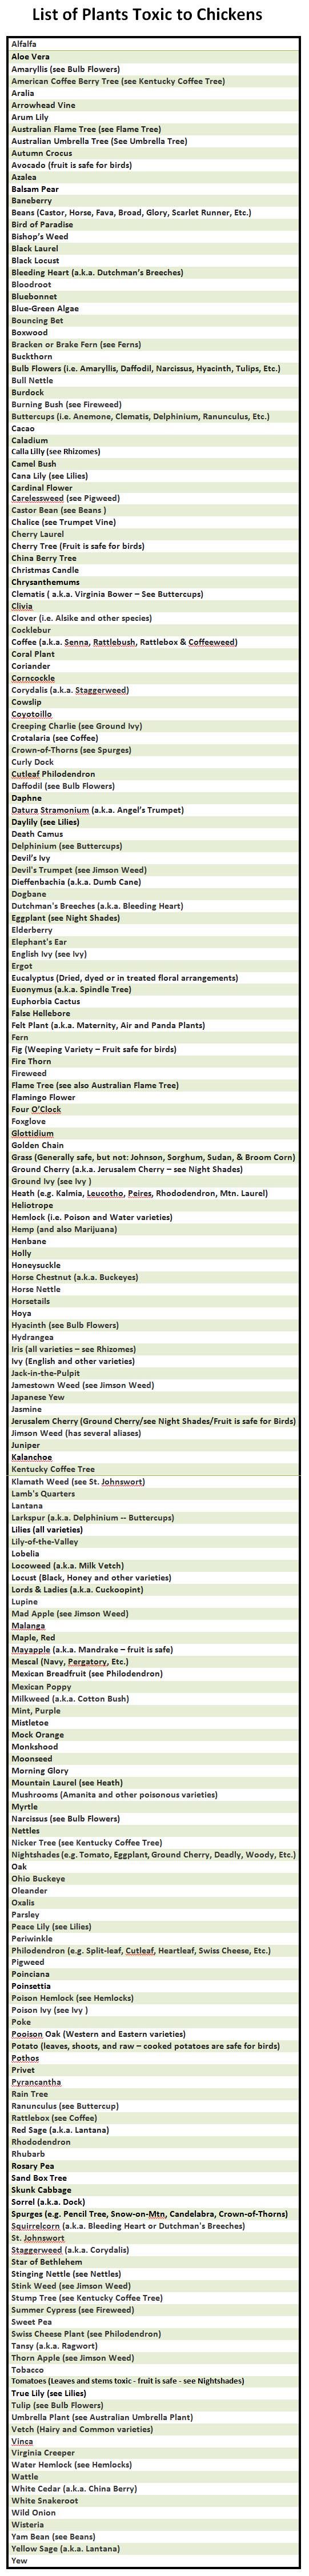 list of toxic plants